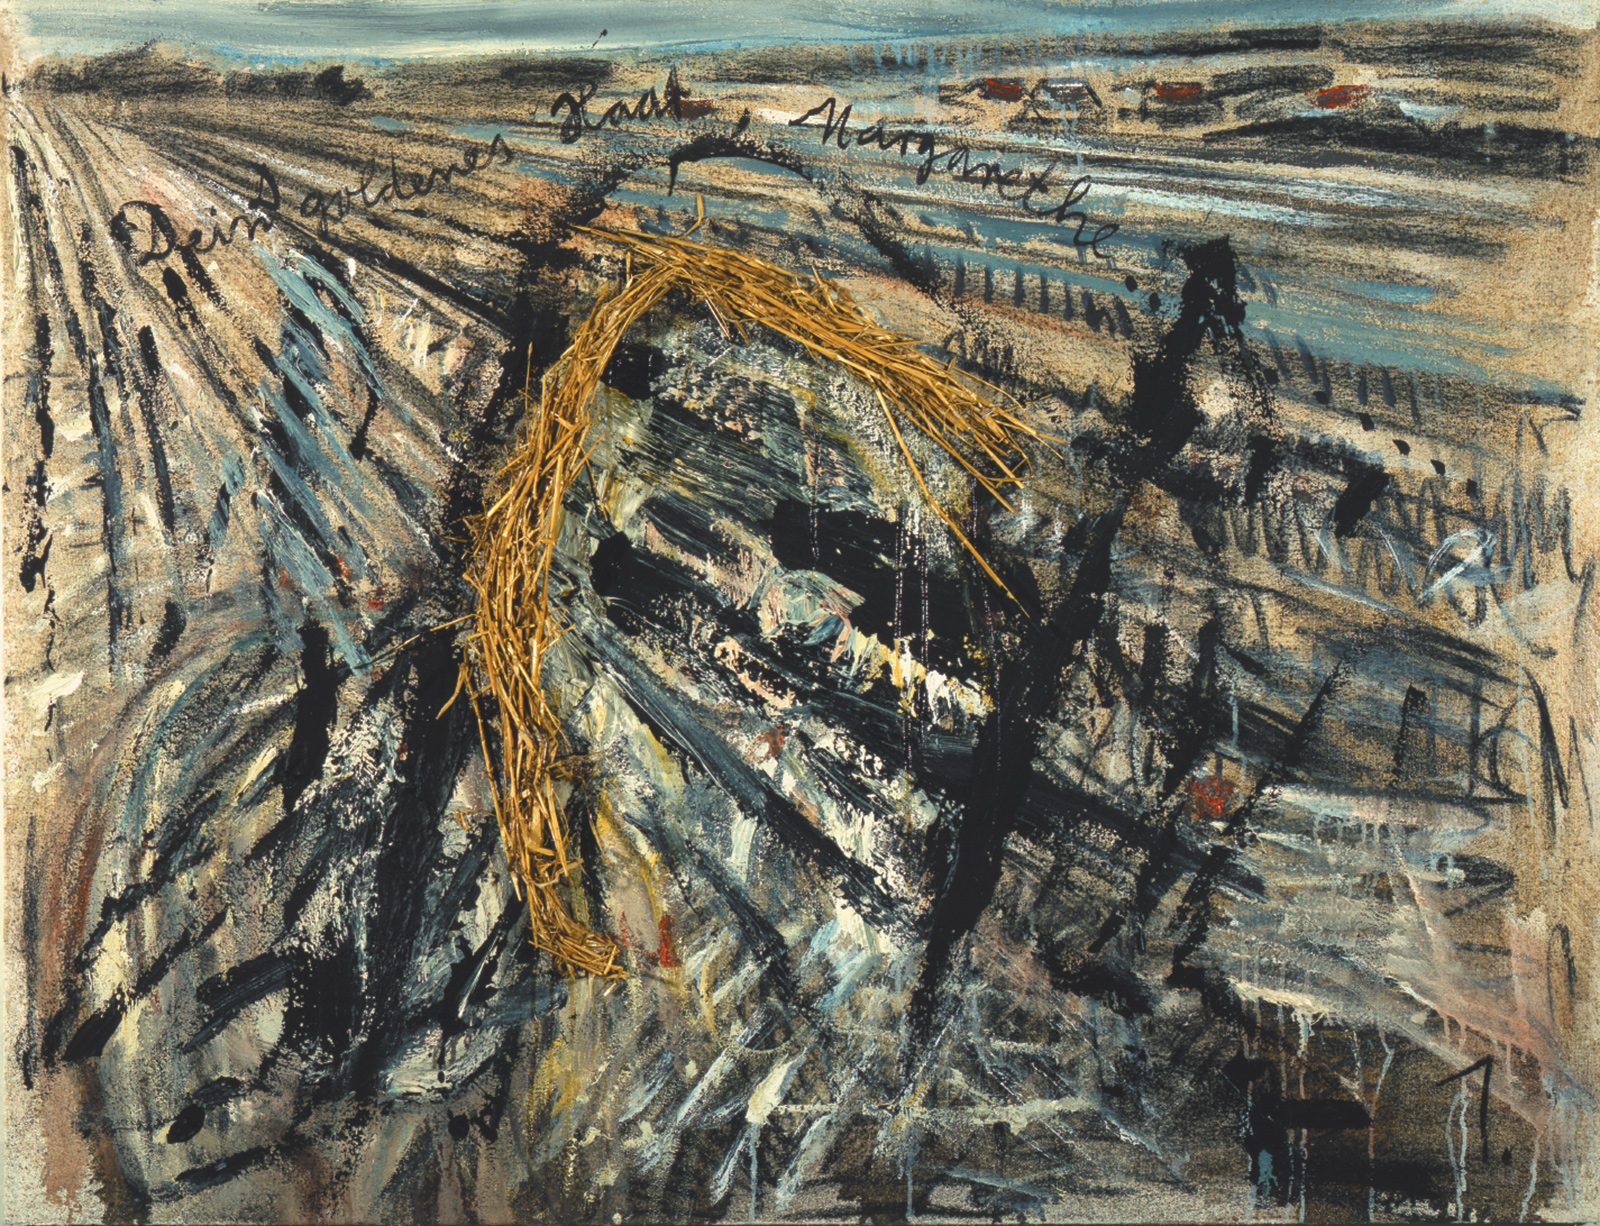 Anselm Kiefer: Your Golden Hair, Margarethe, 1981; from his series of paintings based on Paul Celan's poem 'Todesfuge'